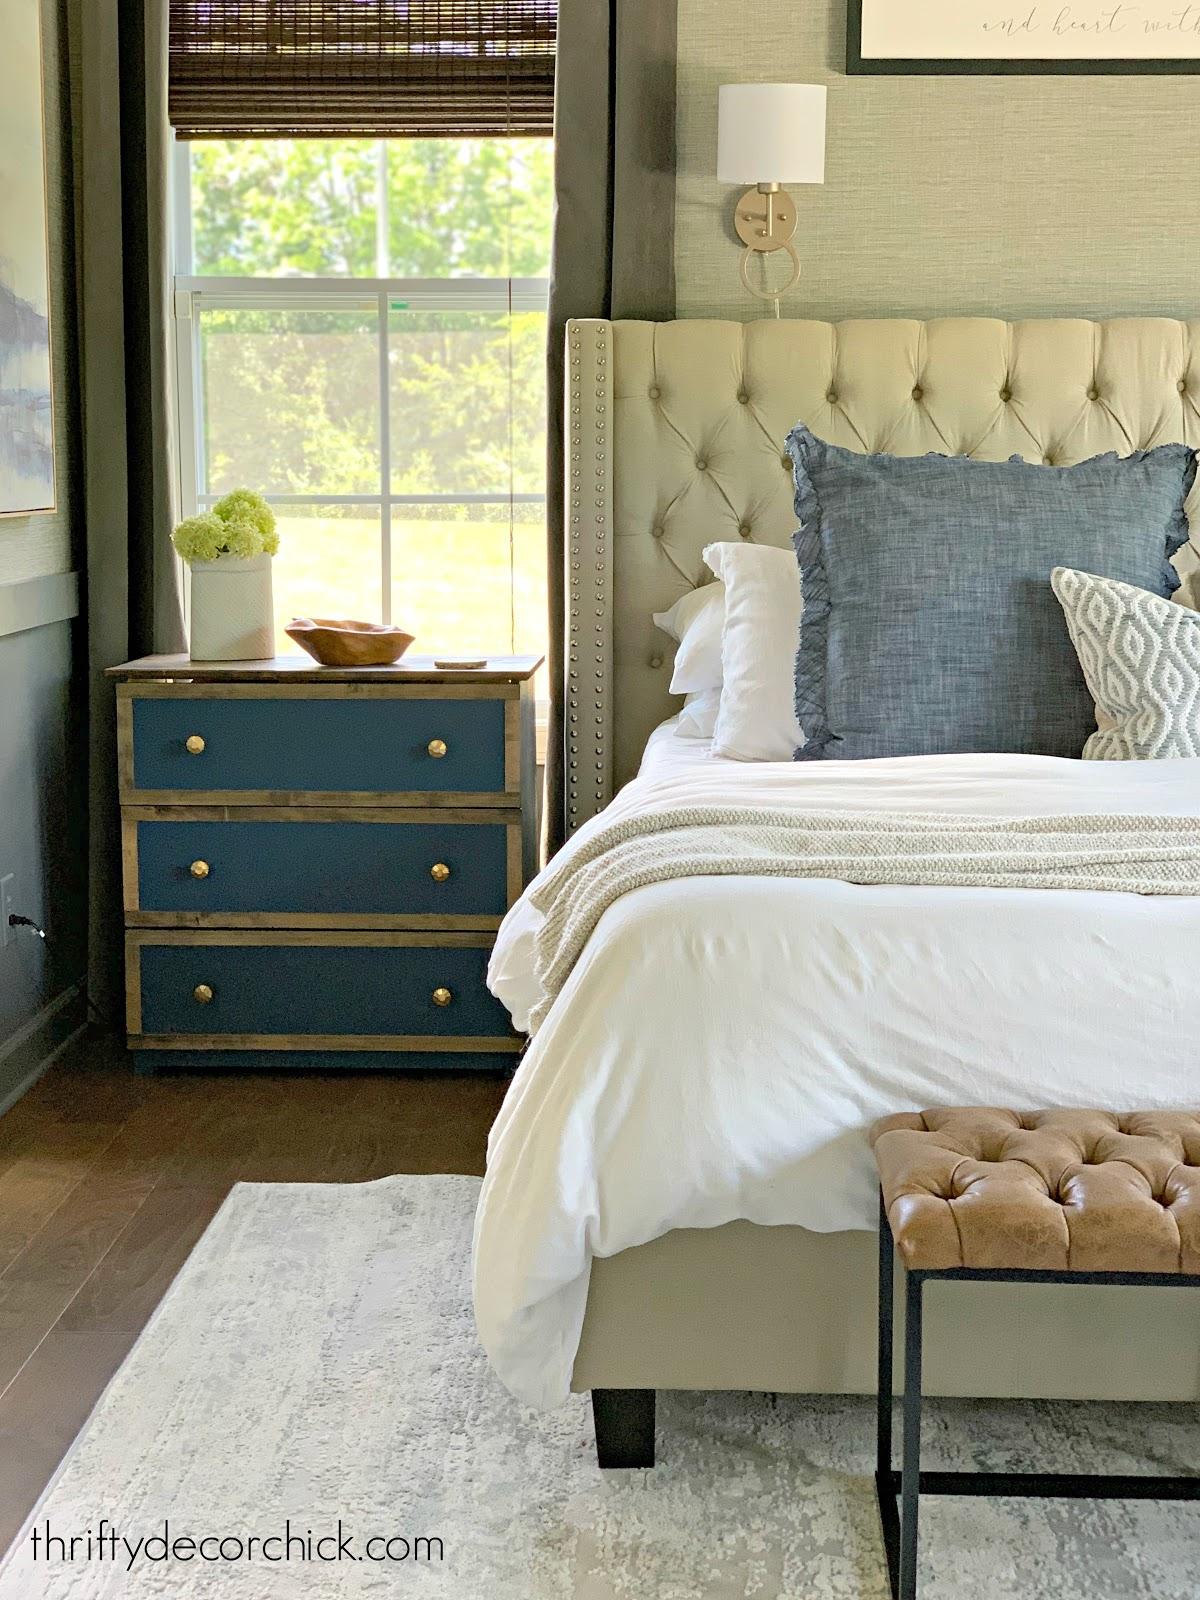 Tarva ikea dresser nightstand